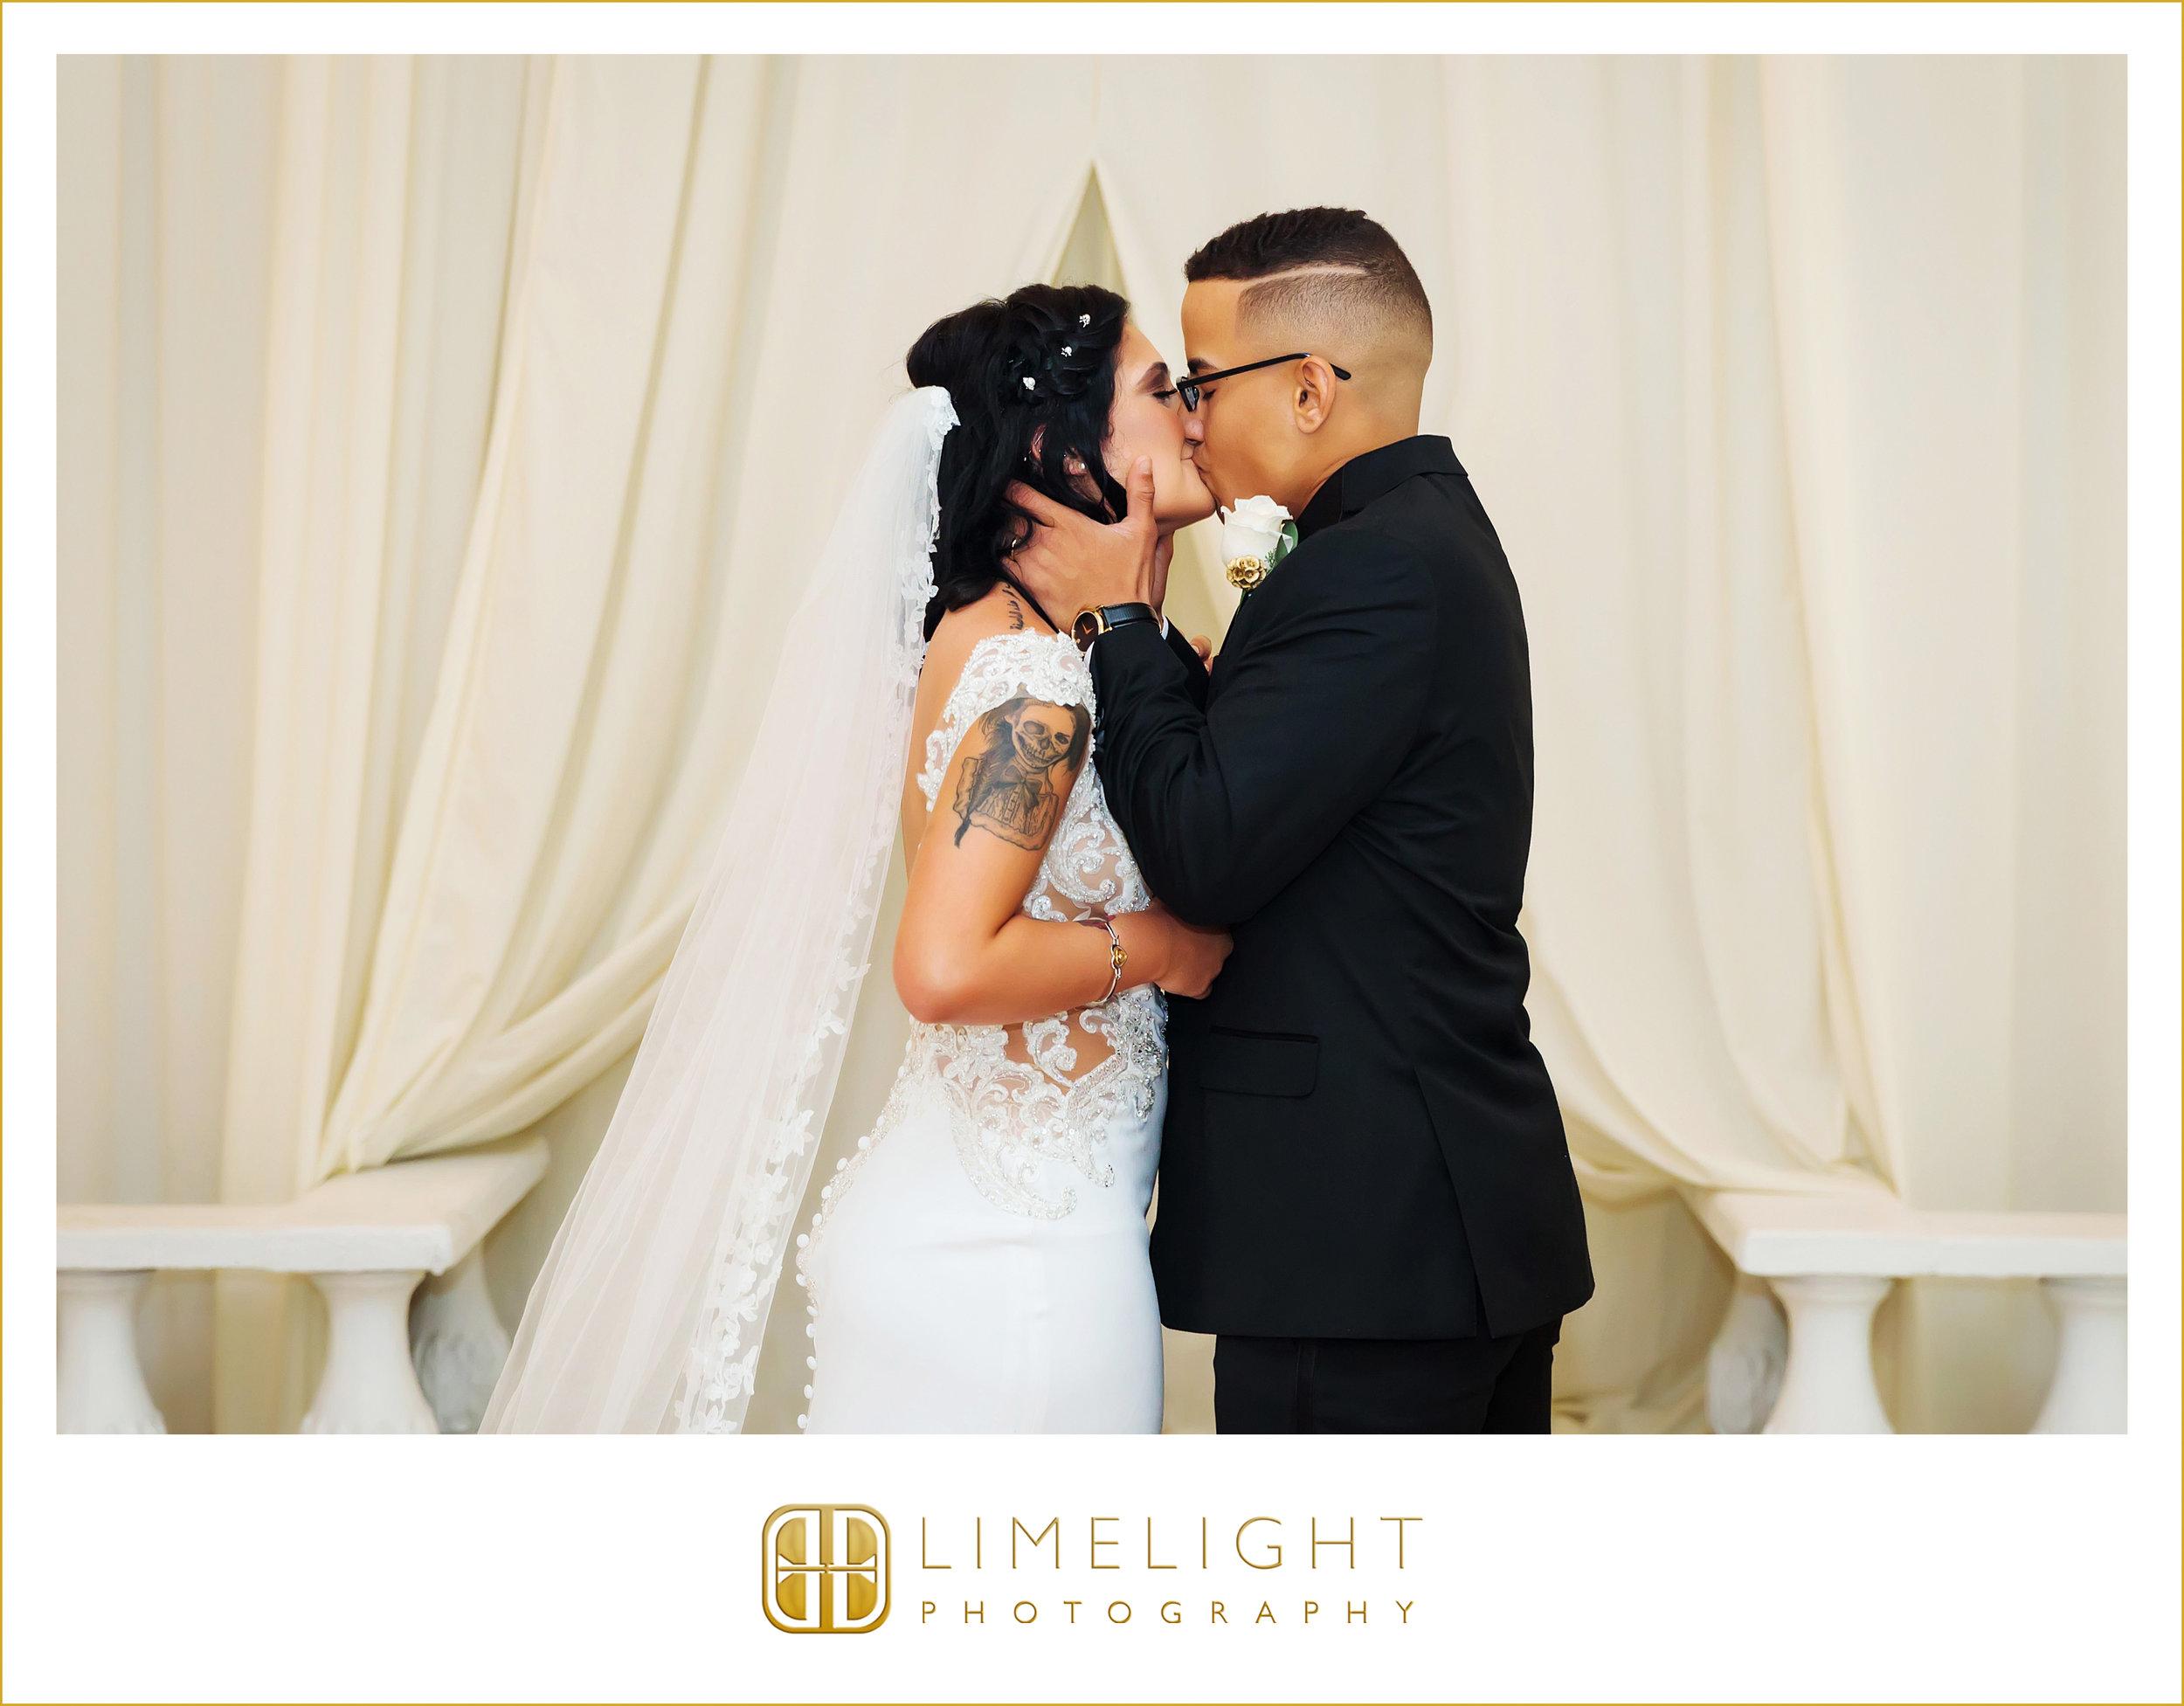 First Kiss | Mr. & Mrs. | Wedding